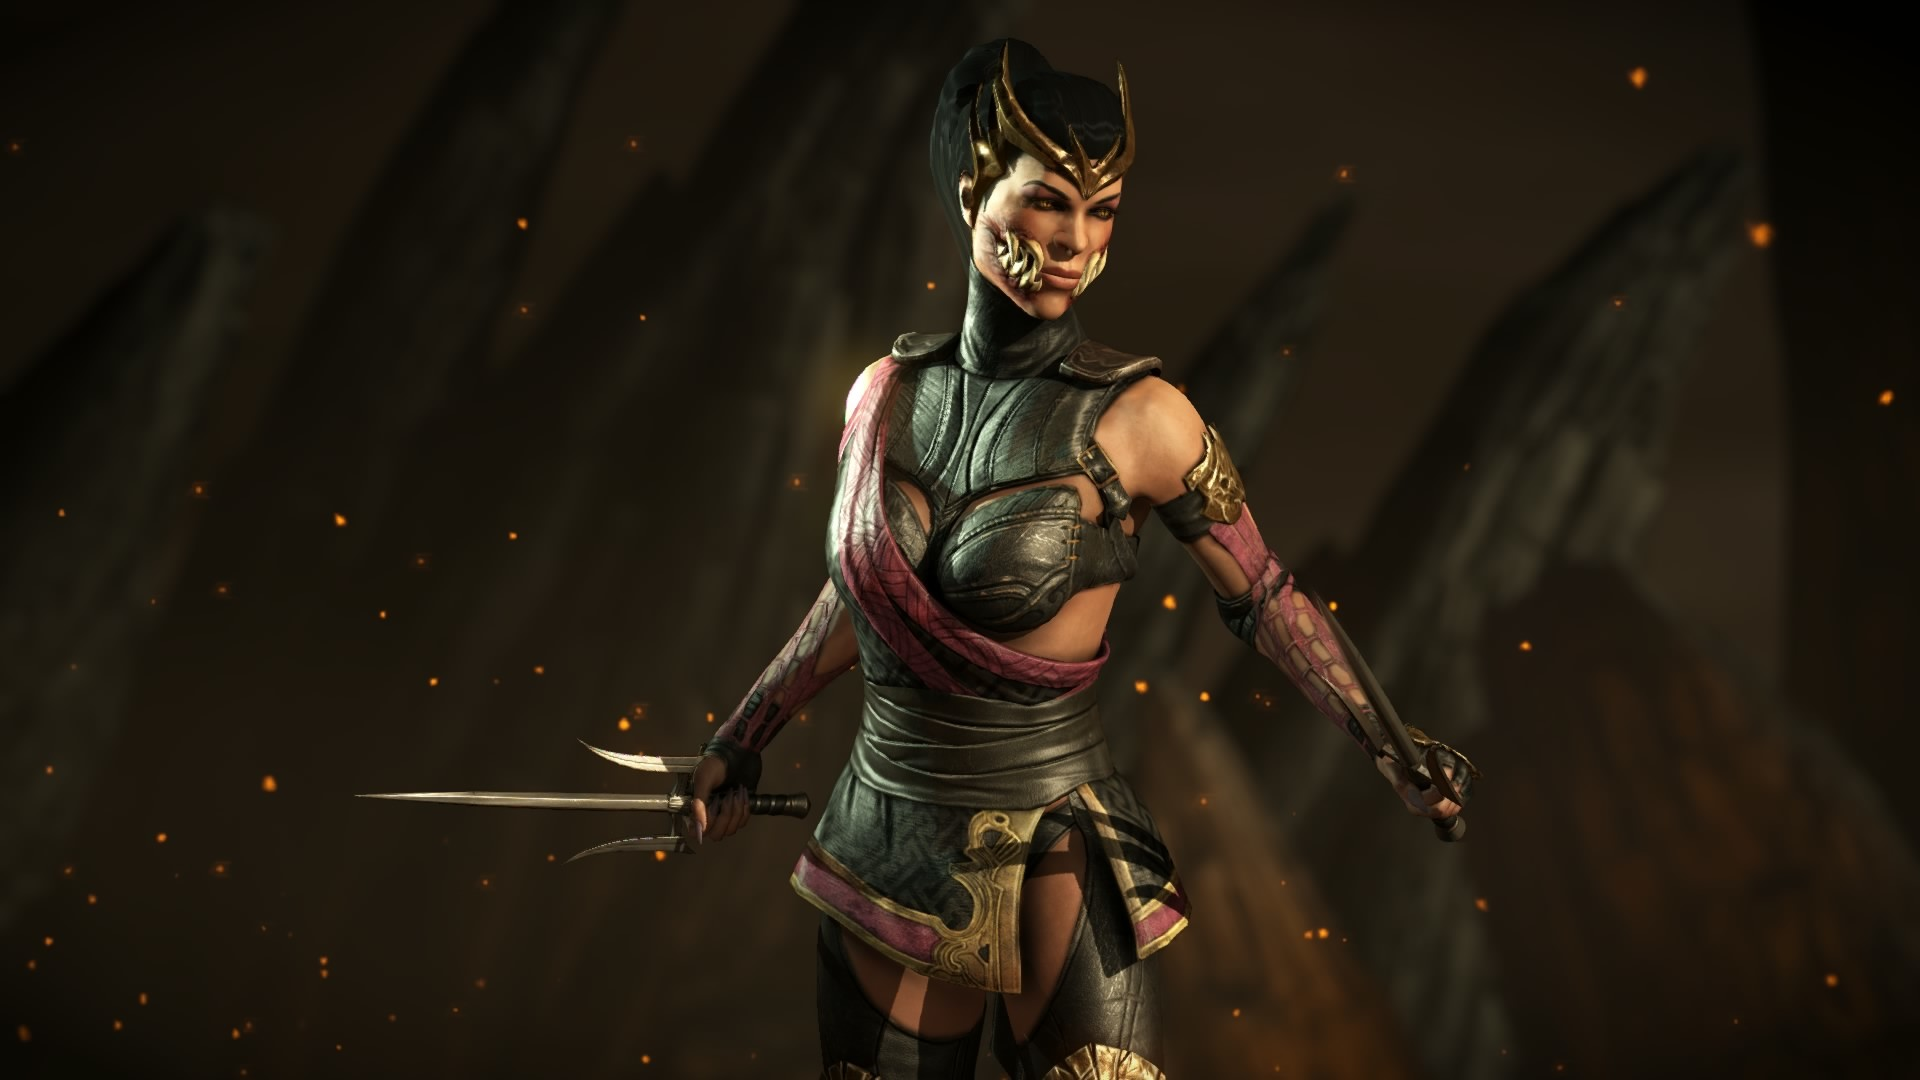 Mortal Kombat X:Mileena Kahnum costume by Kabukiart157 on DeviantArt